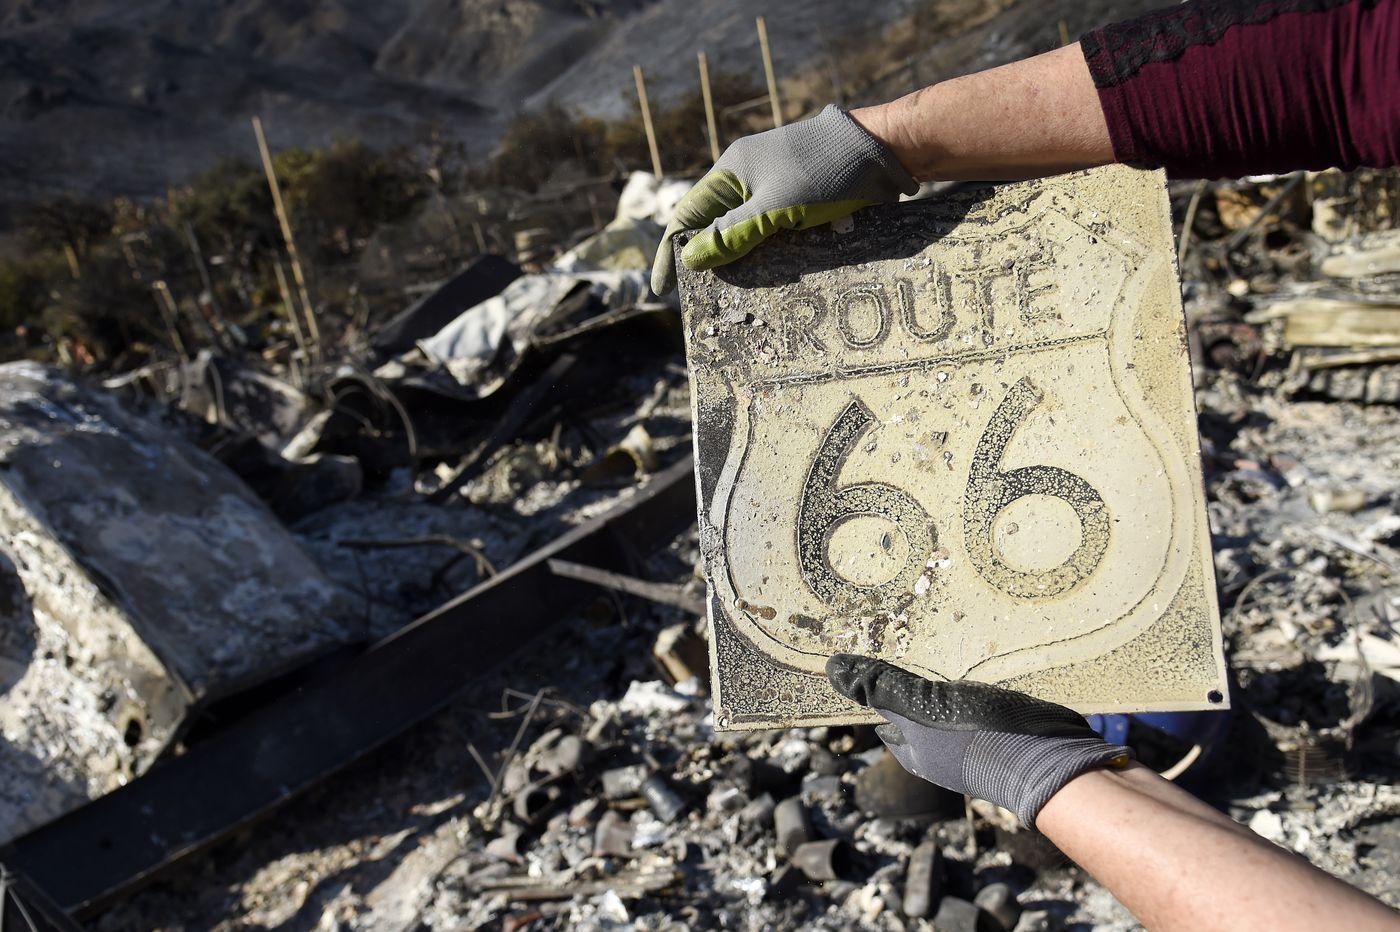 Grim search for more fire victims; 31 dead across California